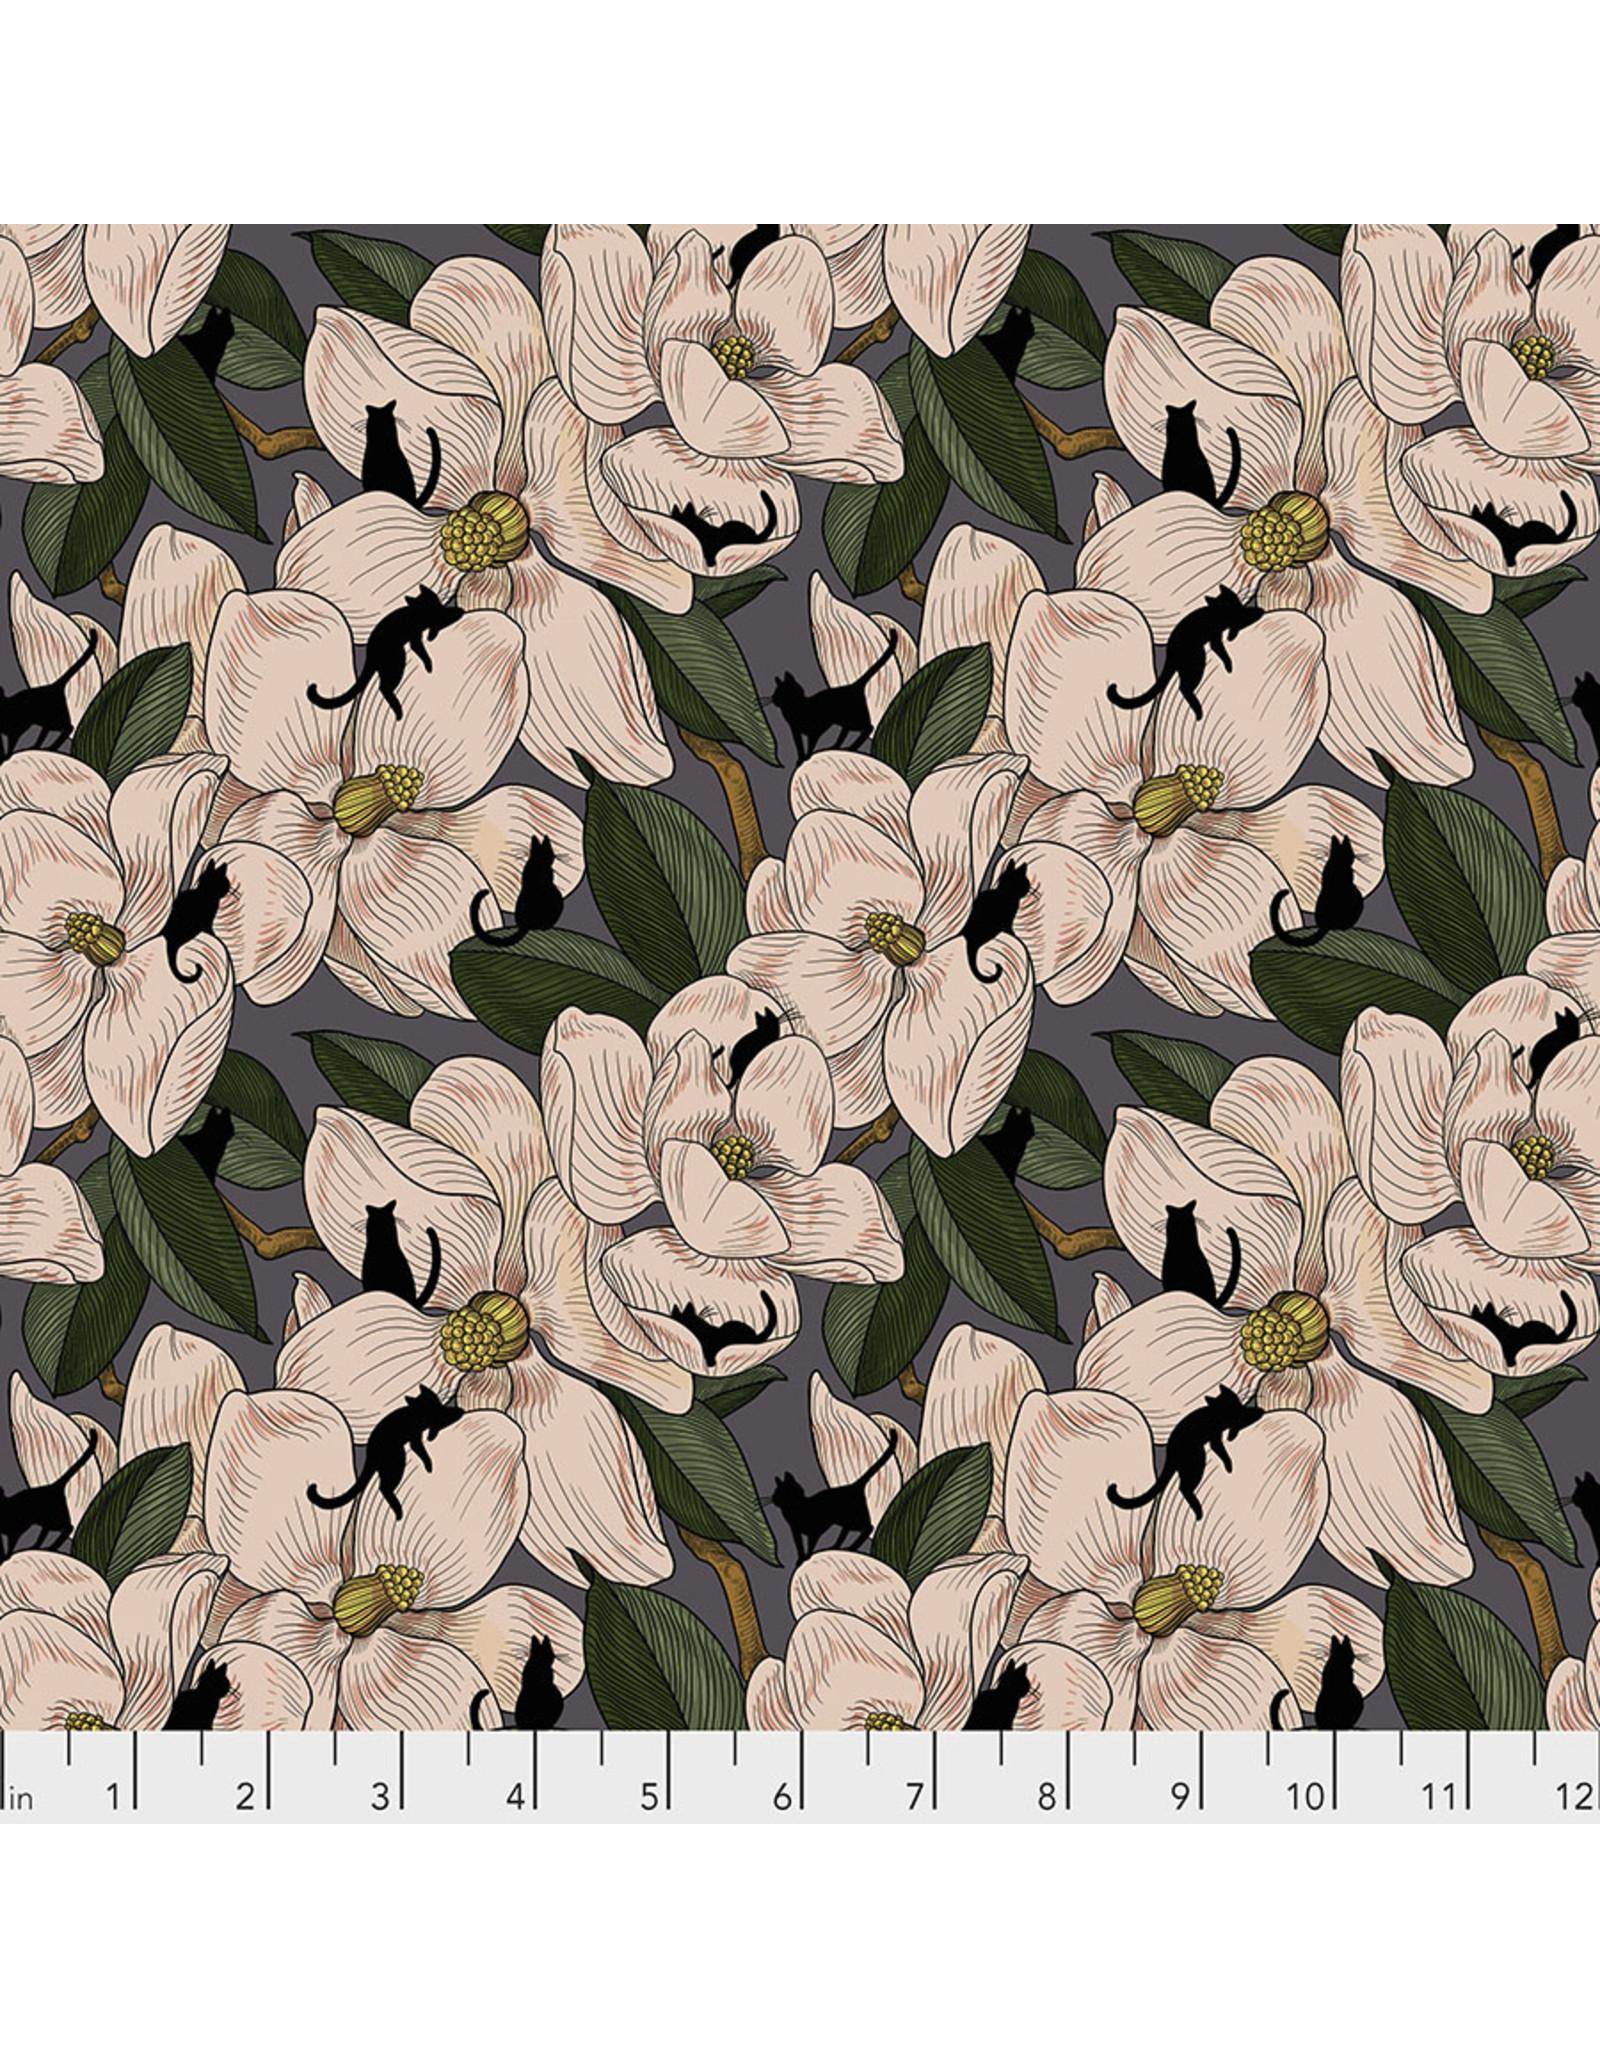 FreeSpirit Cat Tales - Magnolia Garden Natural